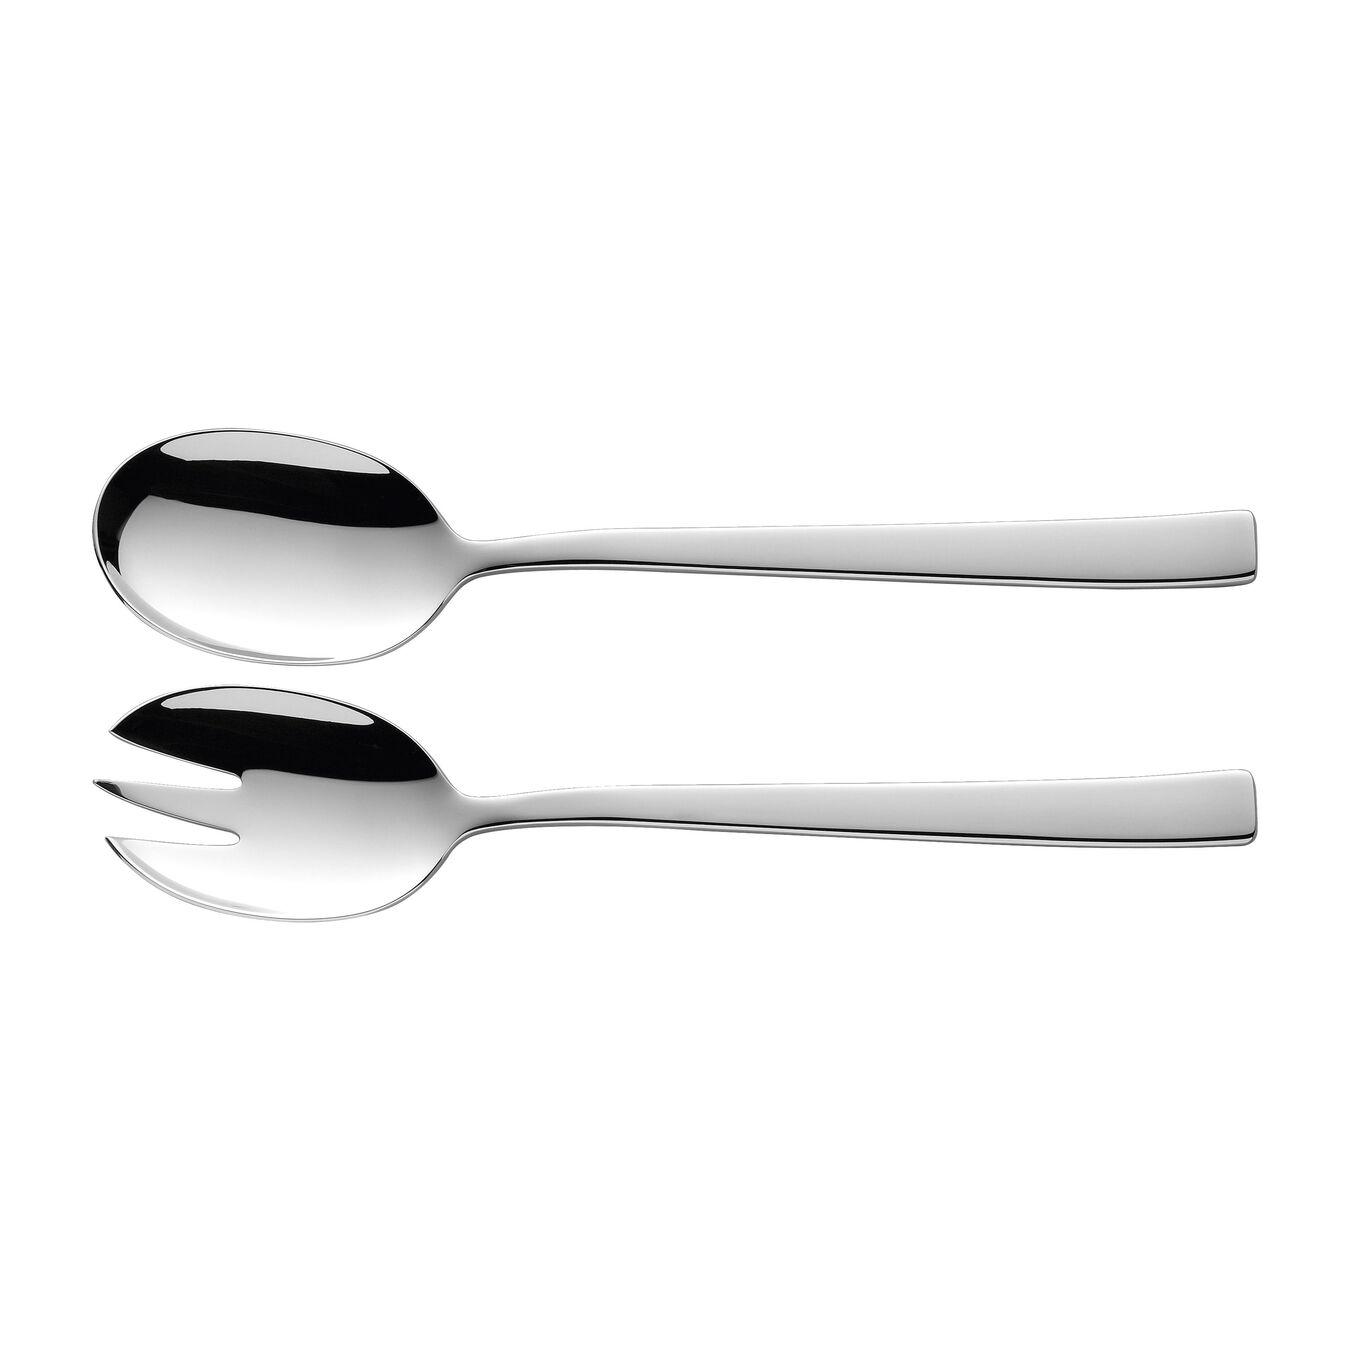 Set di posate da insalata - 2-pz., 18/10 acciaio inossidabile,,large 1